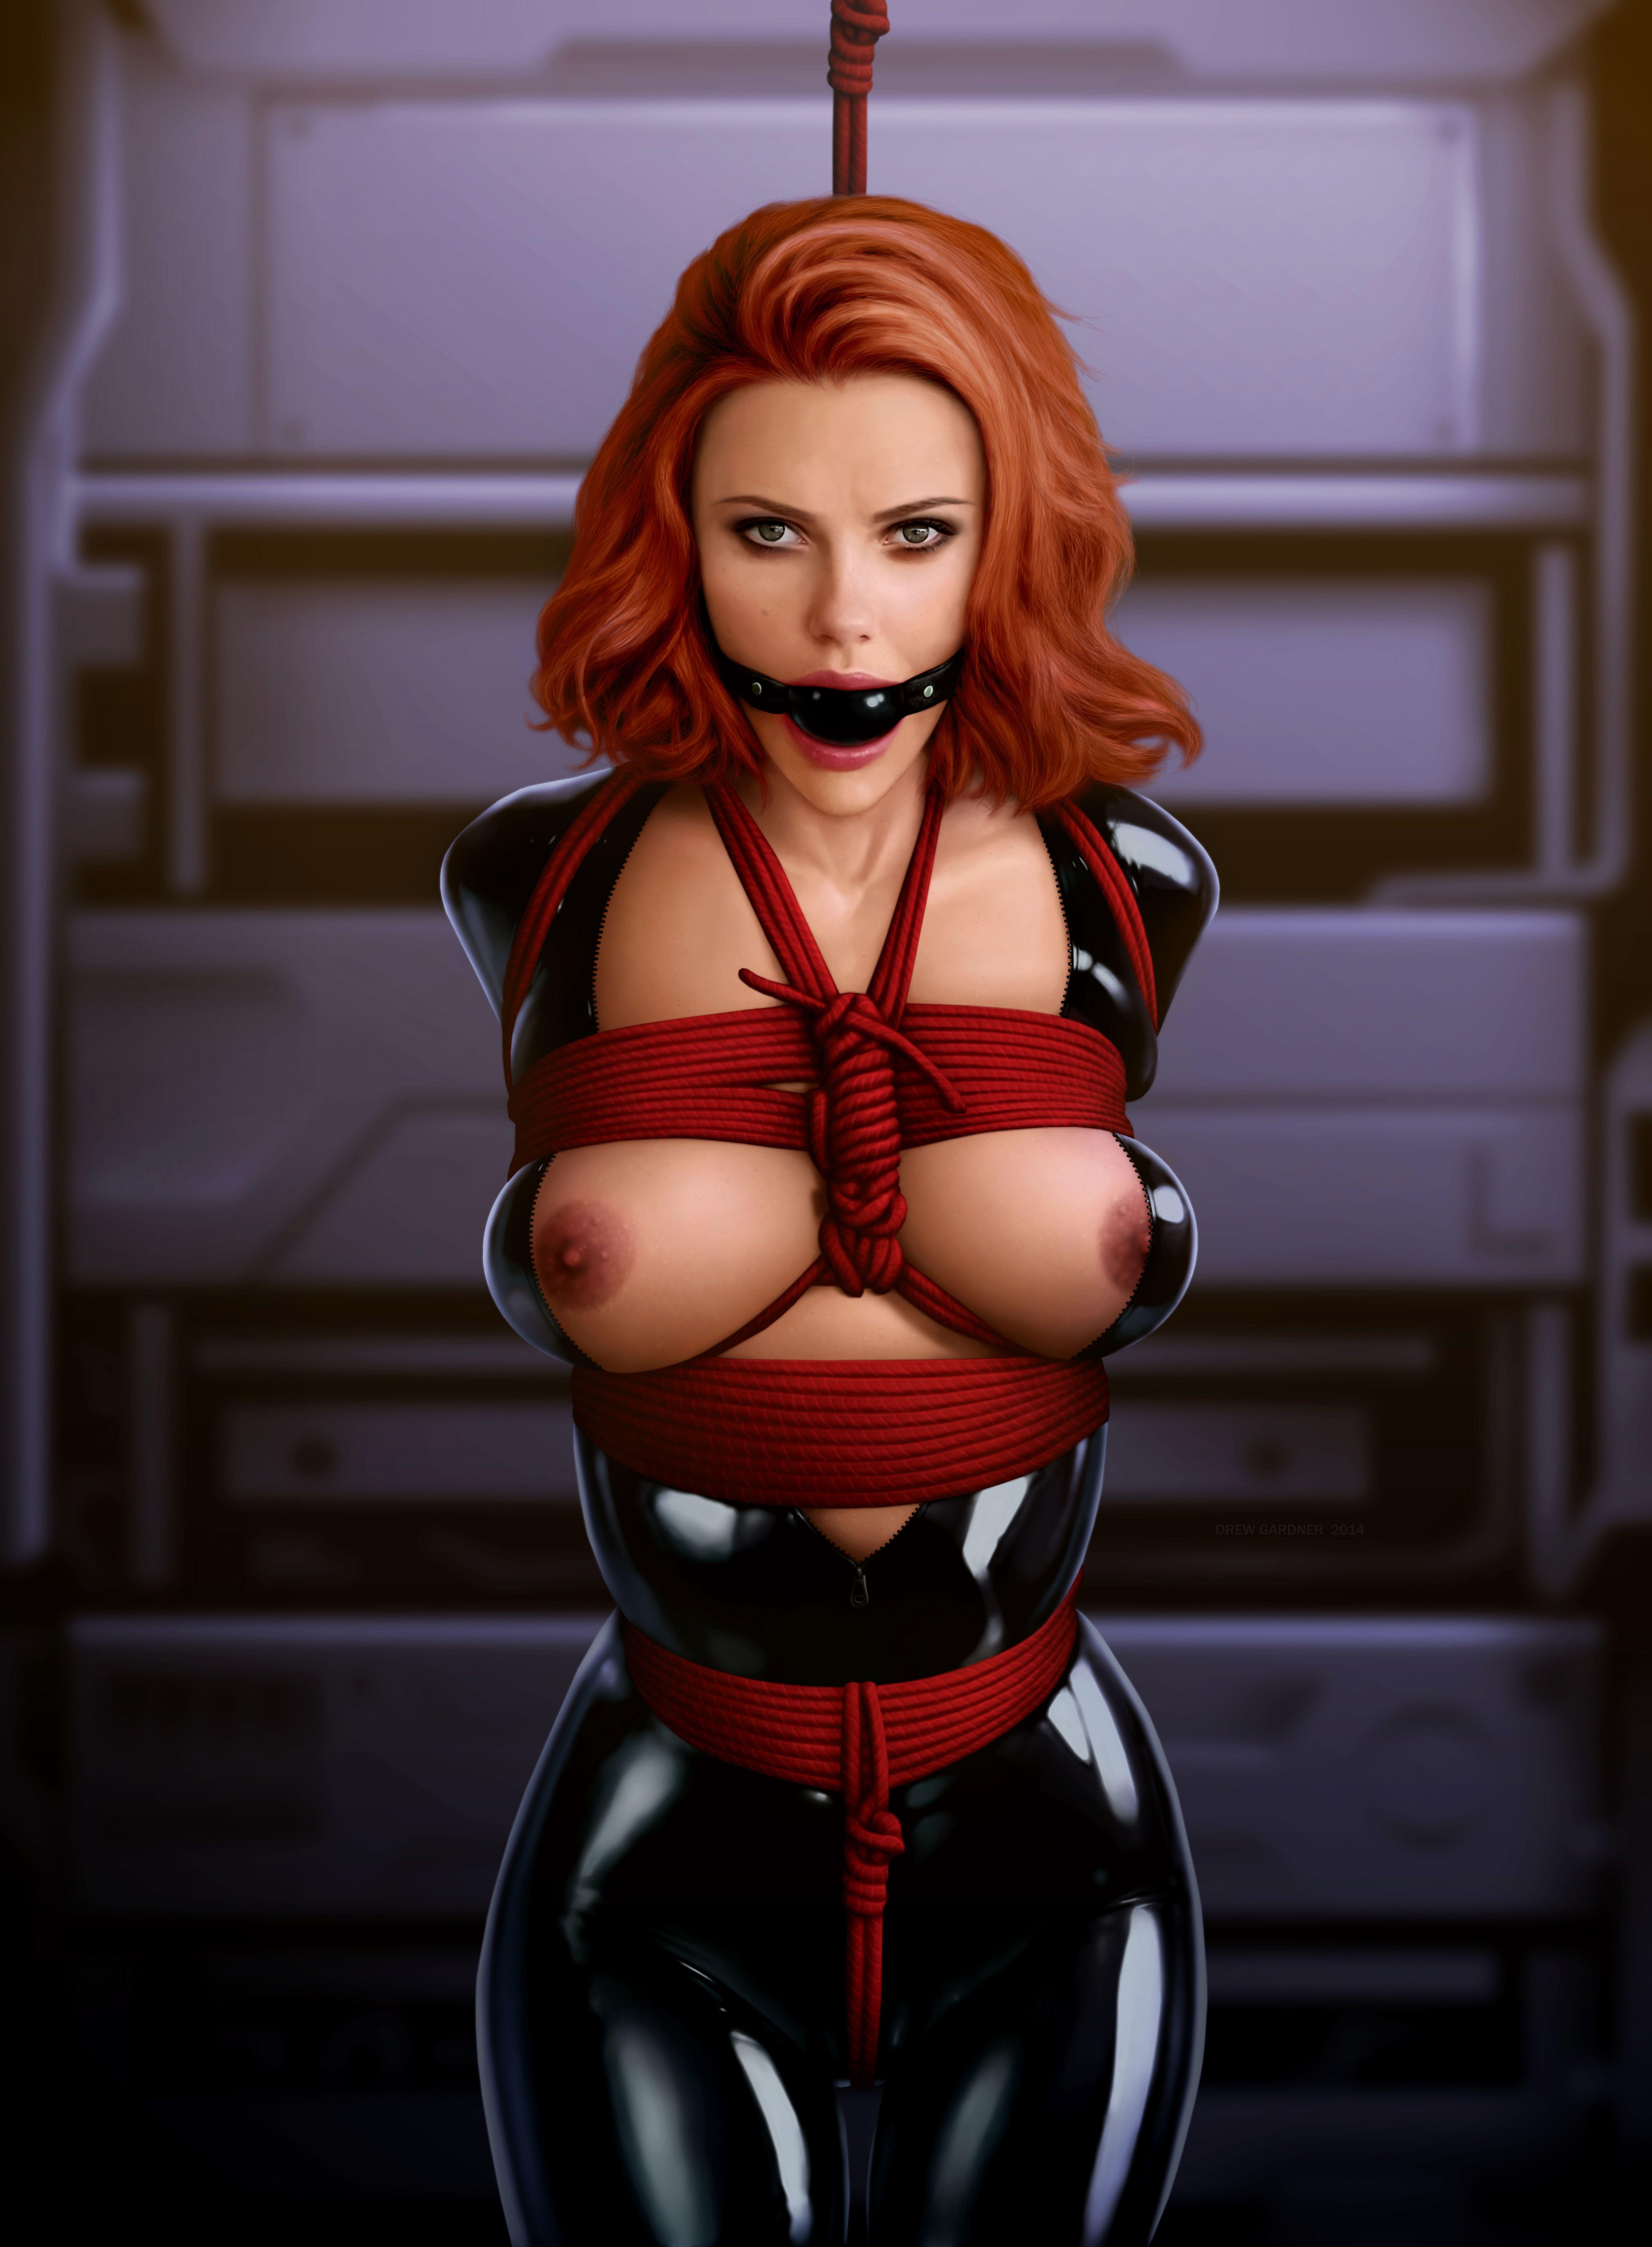 widow black porn romanoff Natasha